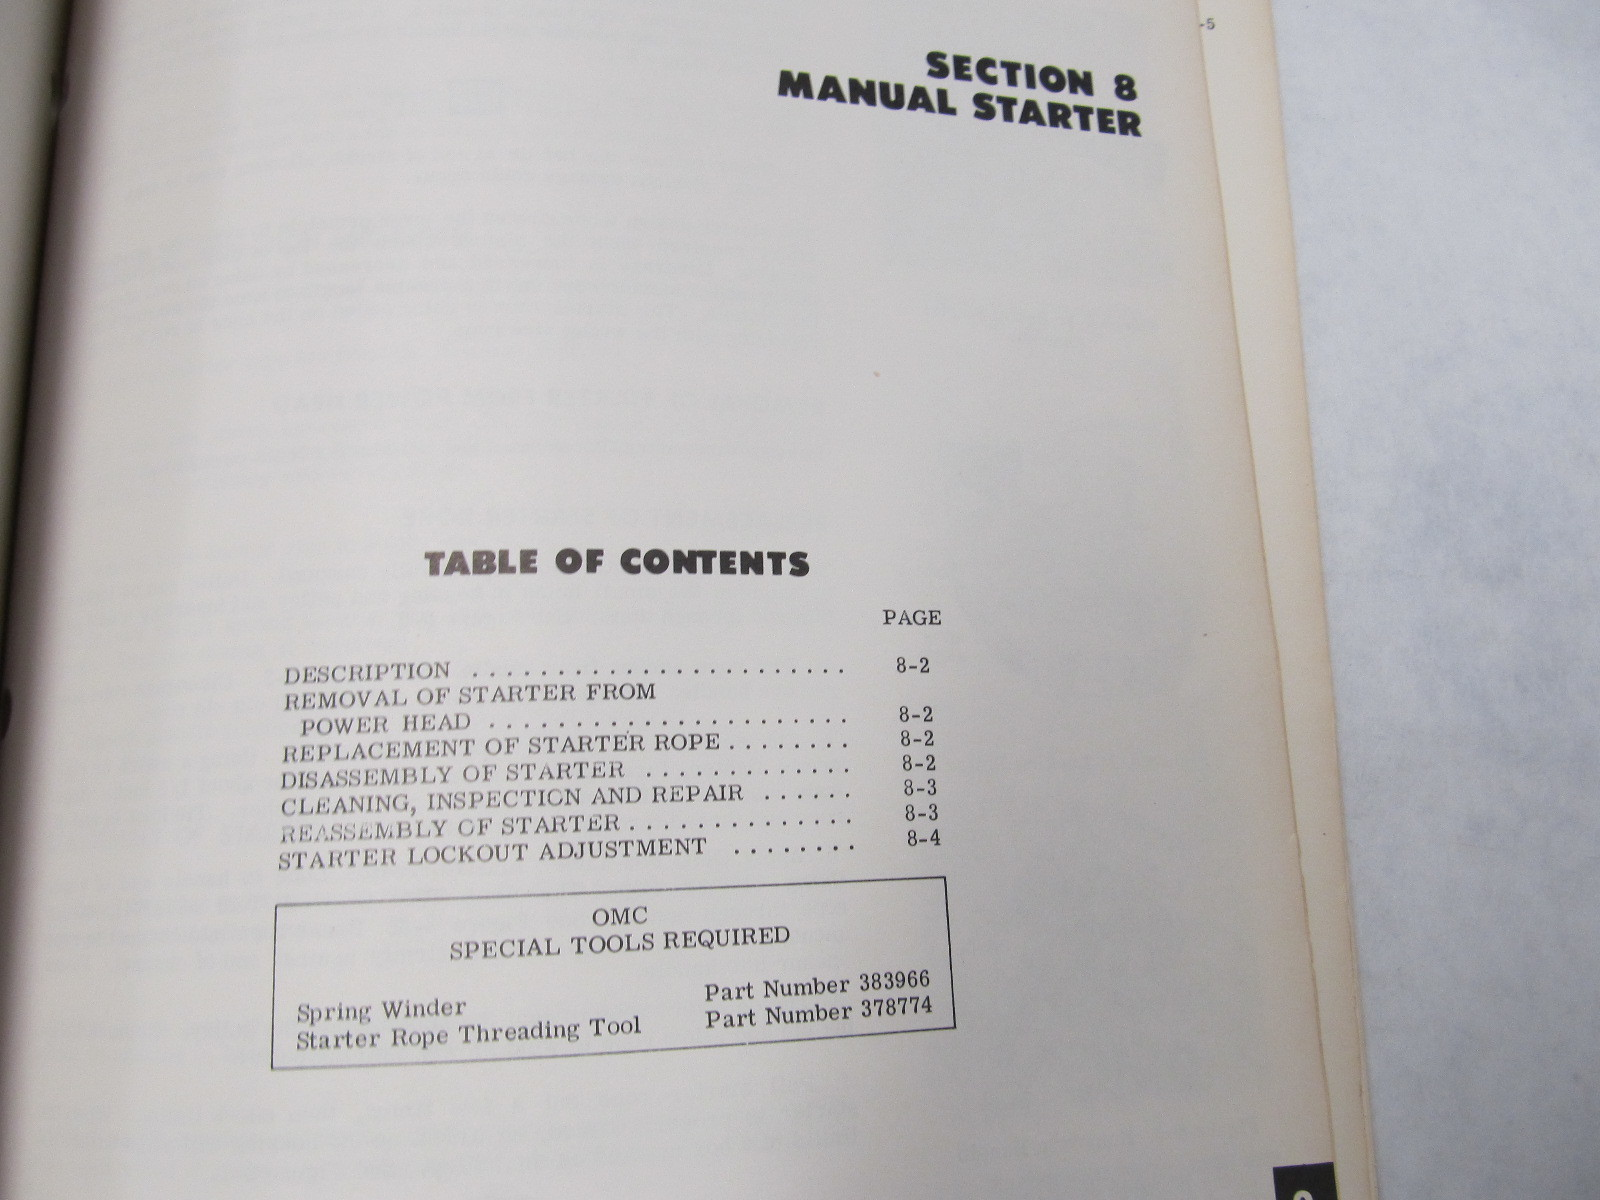 Evinrude 25 hp service Manual